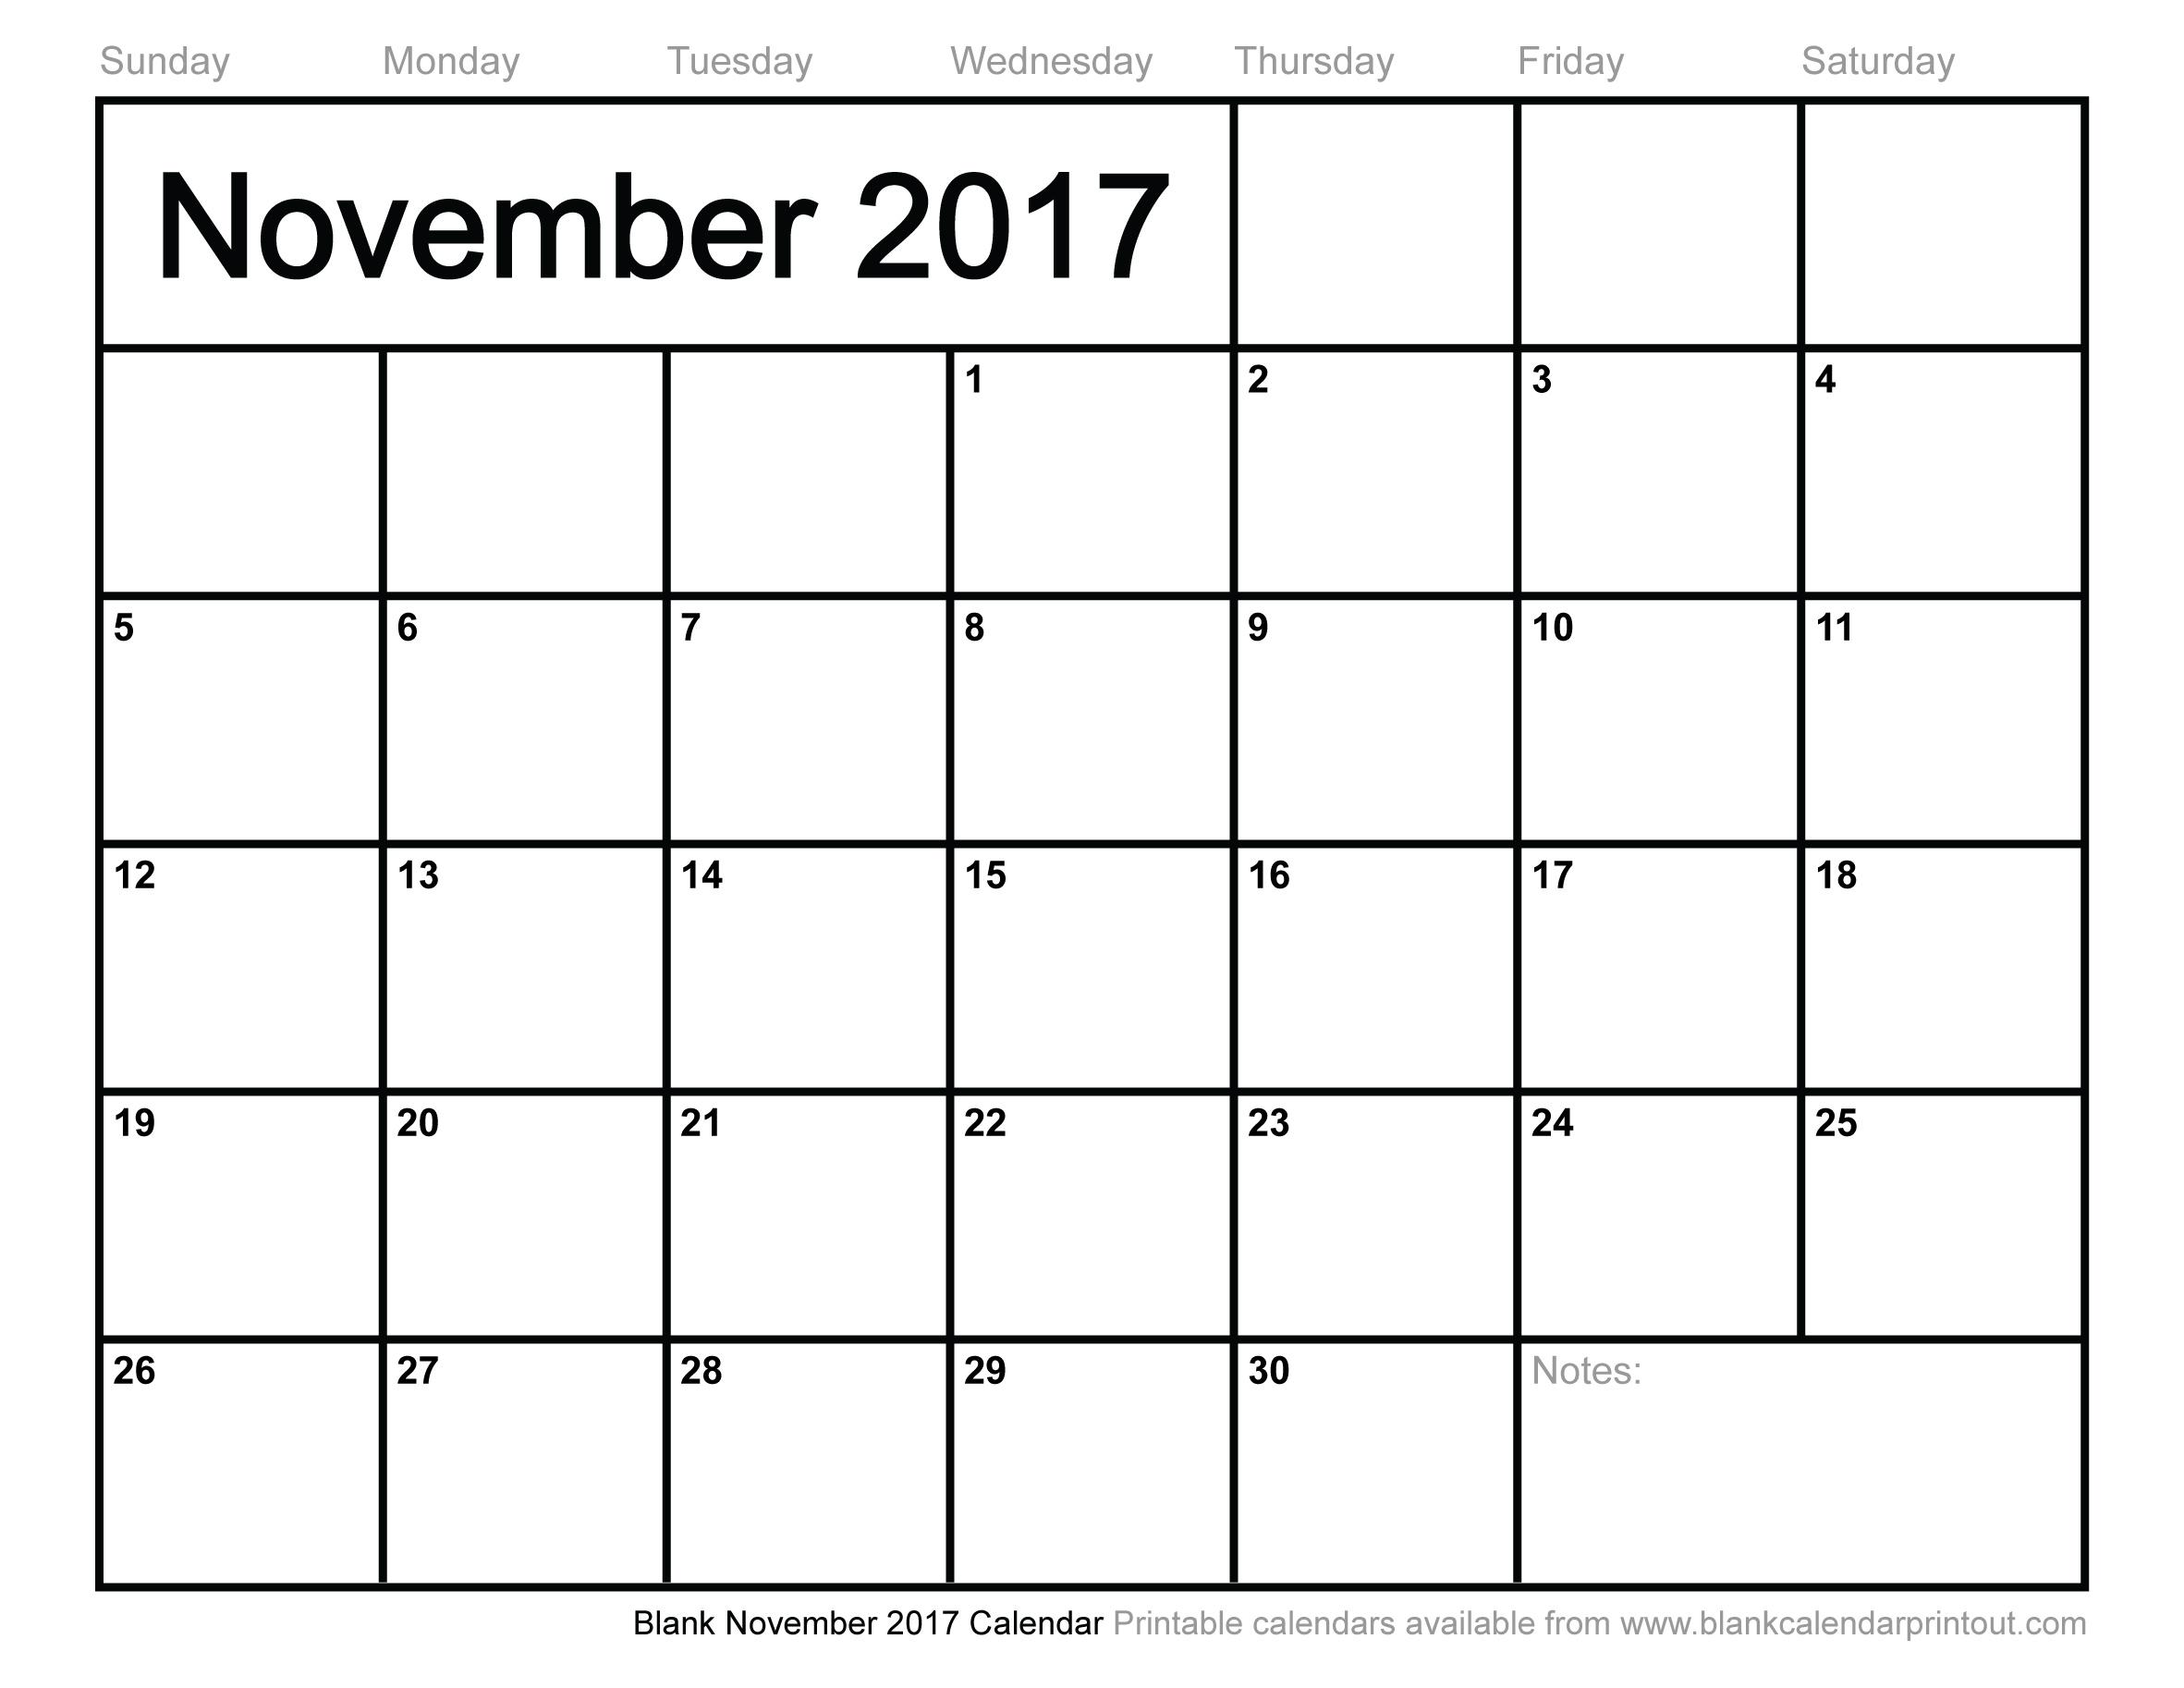 Blank November 2017 Calendar to Print